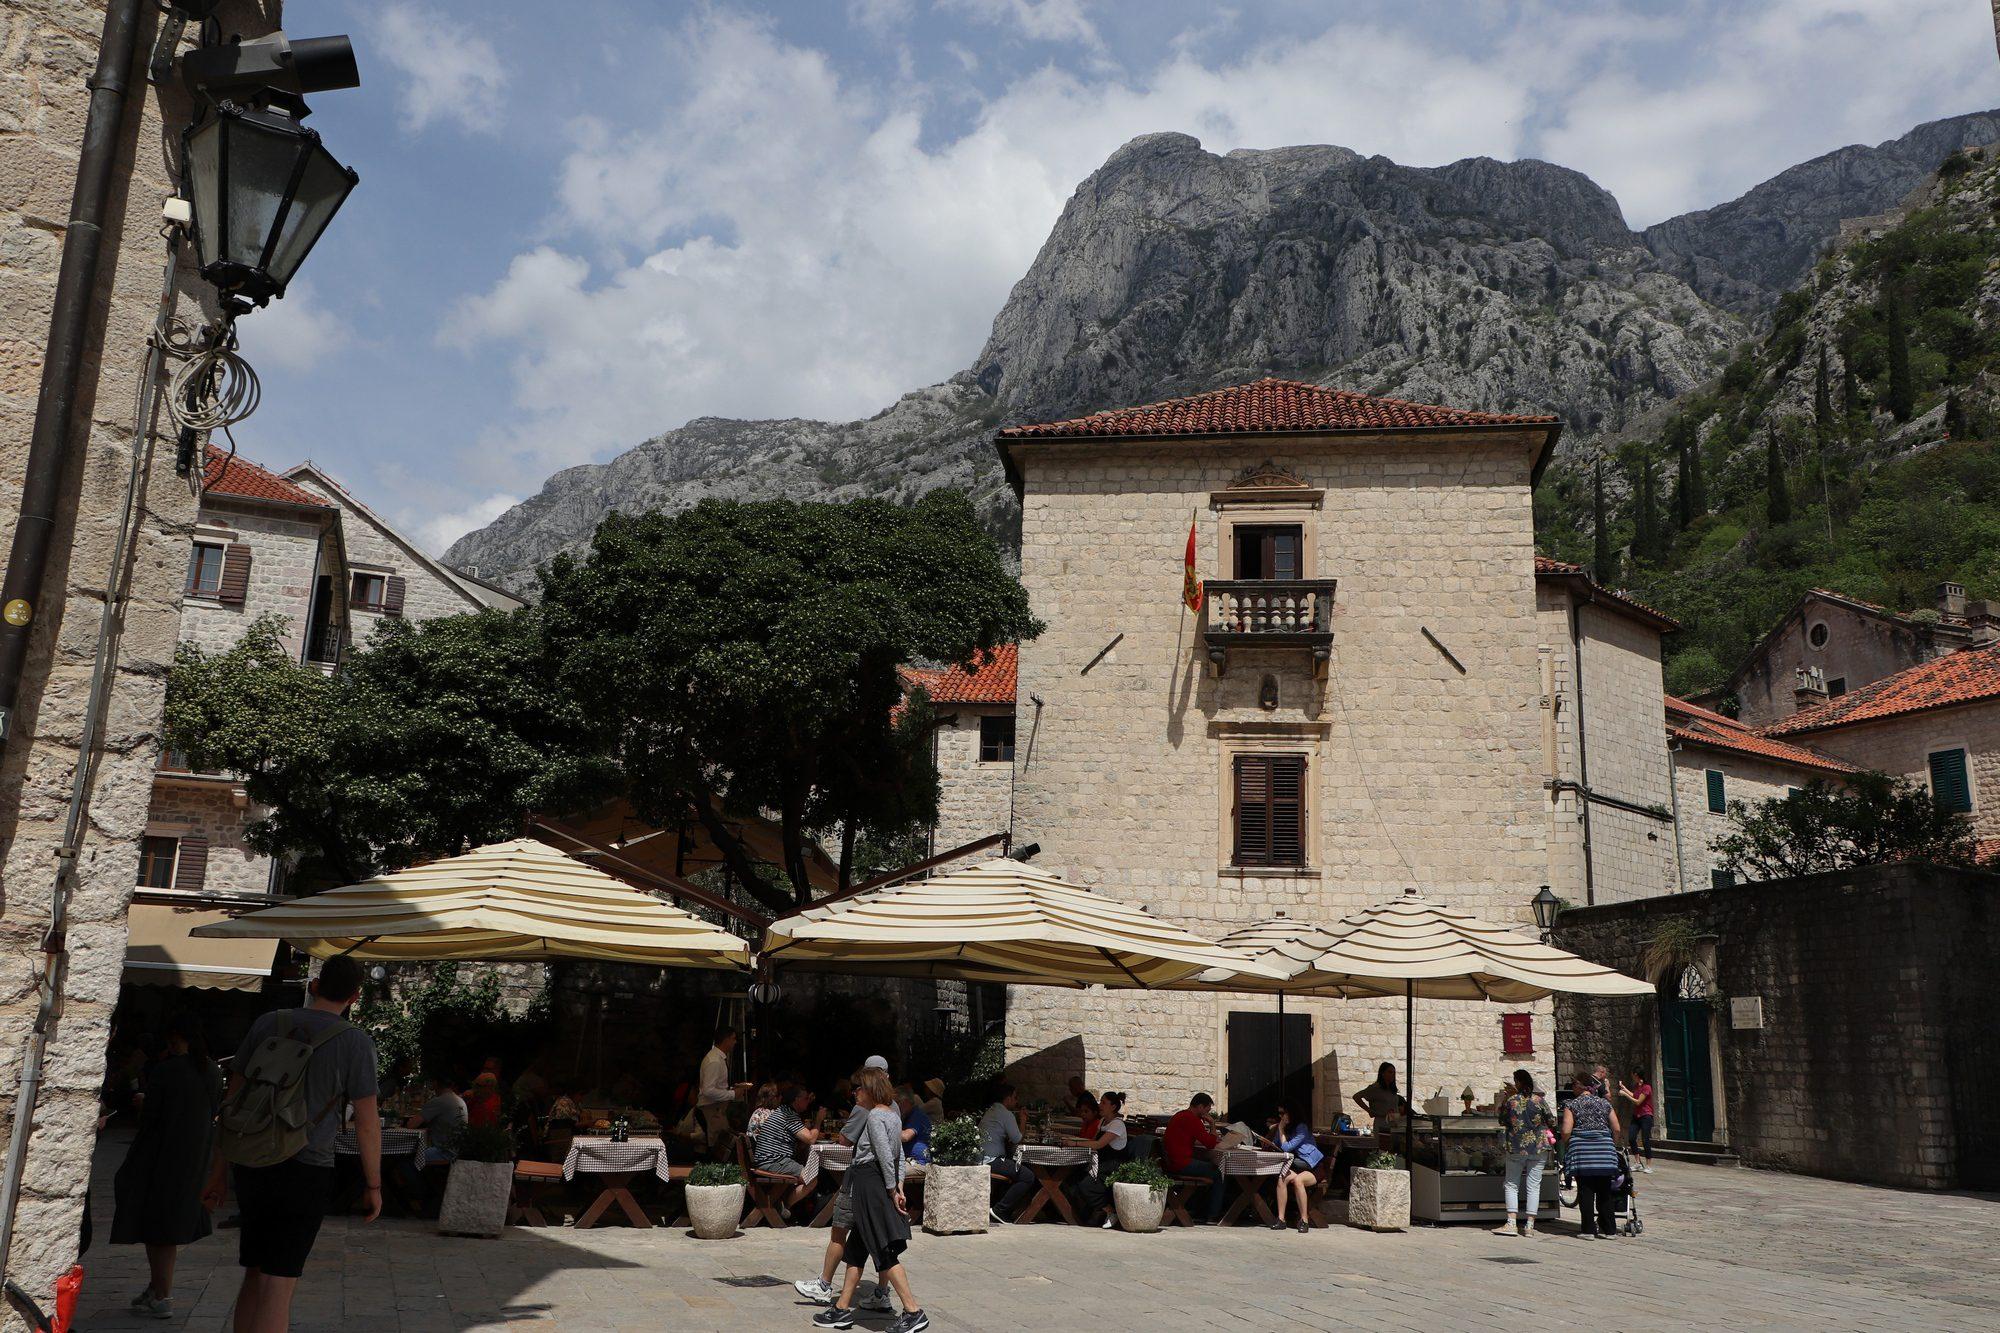 Platz in Kotor